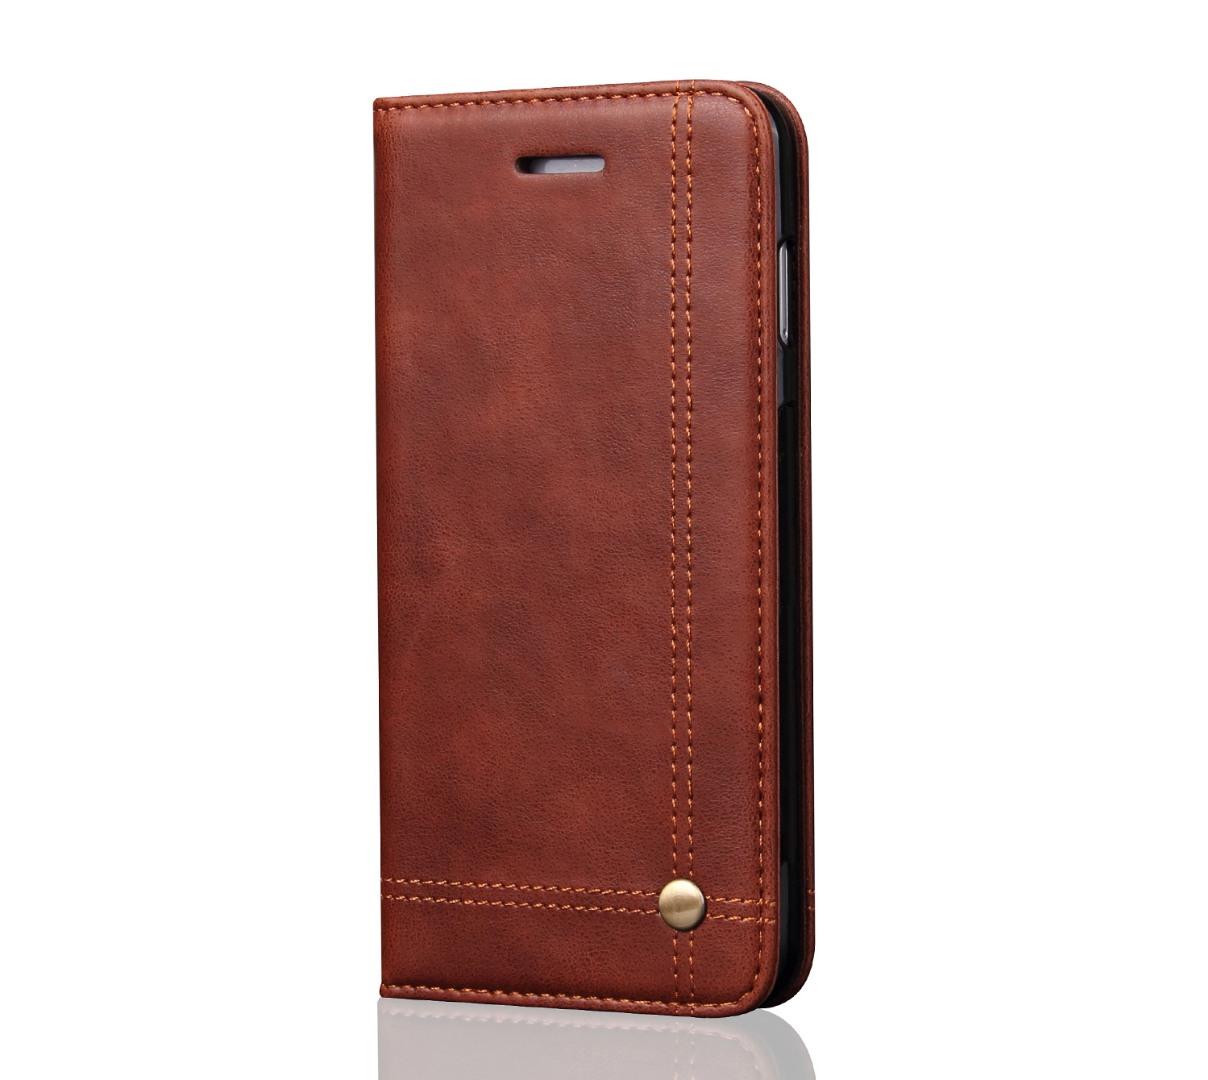 Husa piele, tip portofel, cusaturi ornamentale, stand, inchidere magnetica, iPhone X / XS - CaseMe, Maro coffee